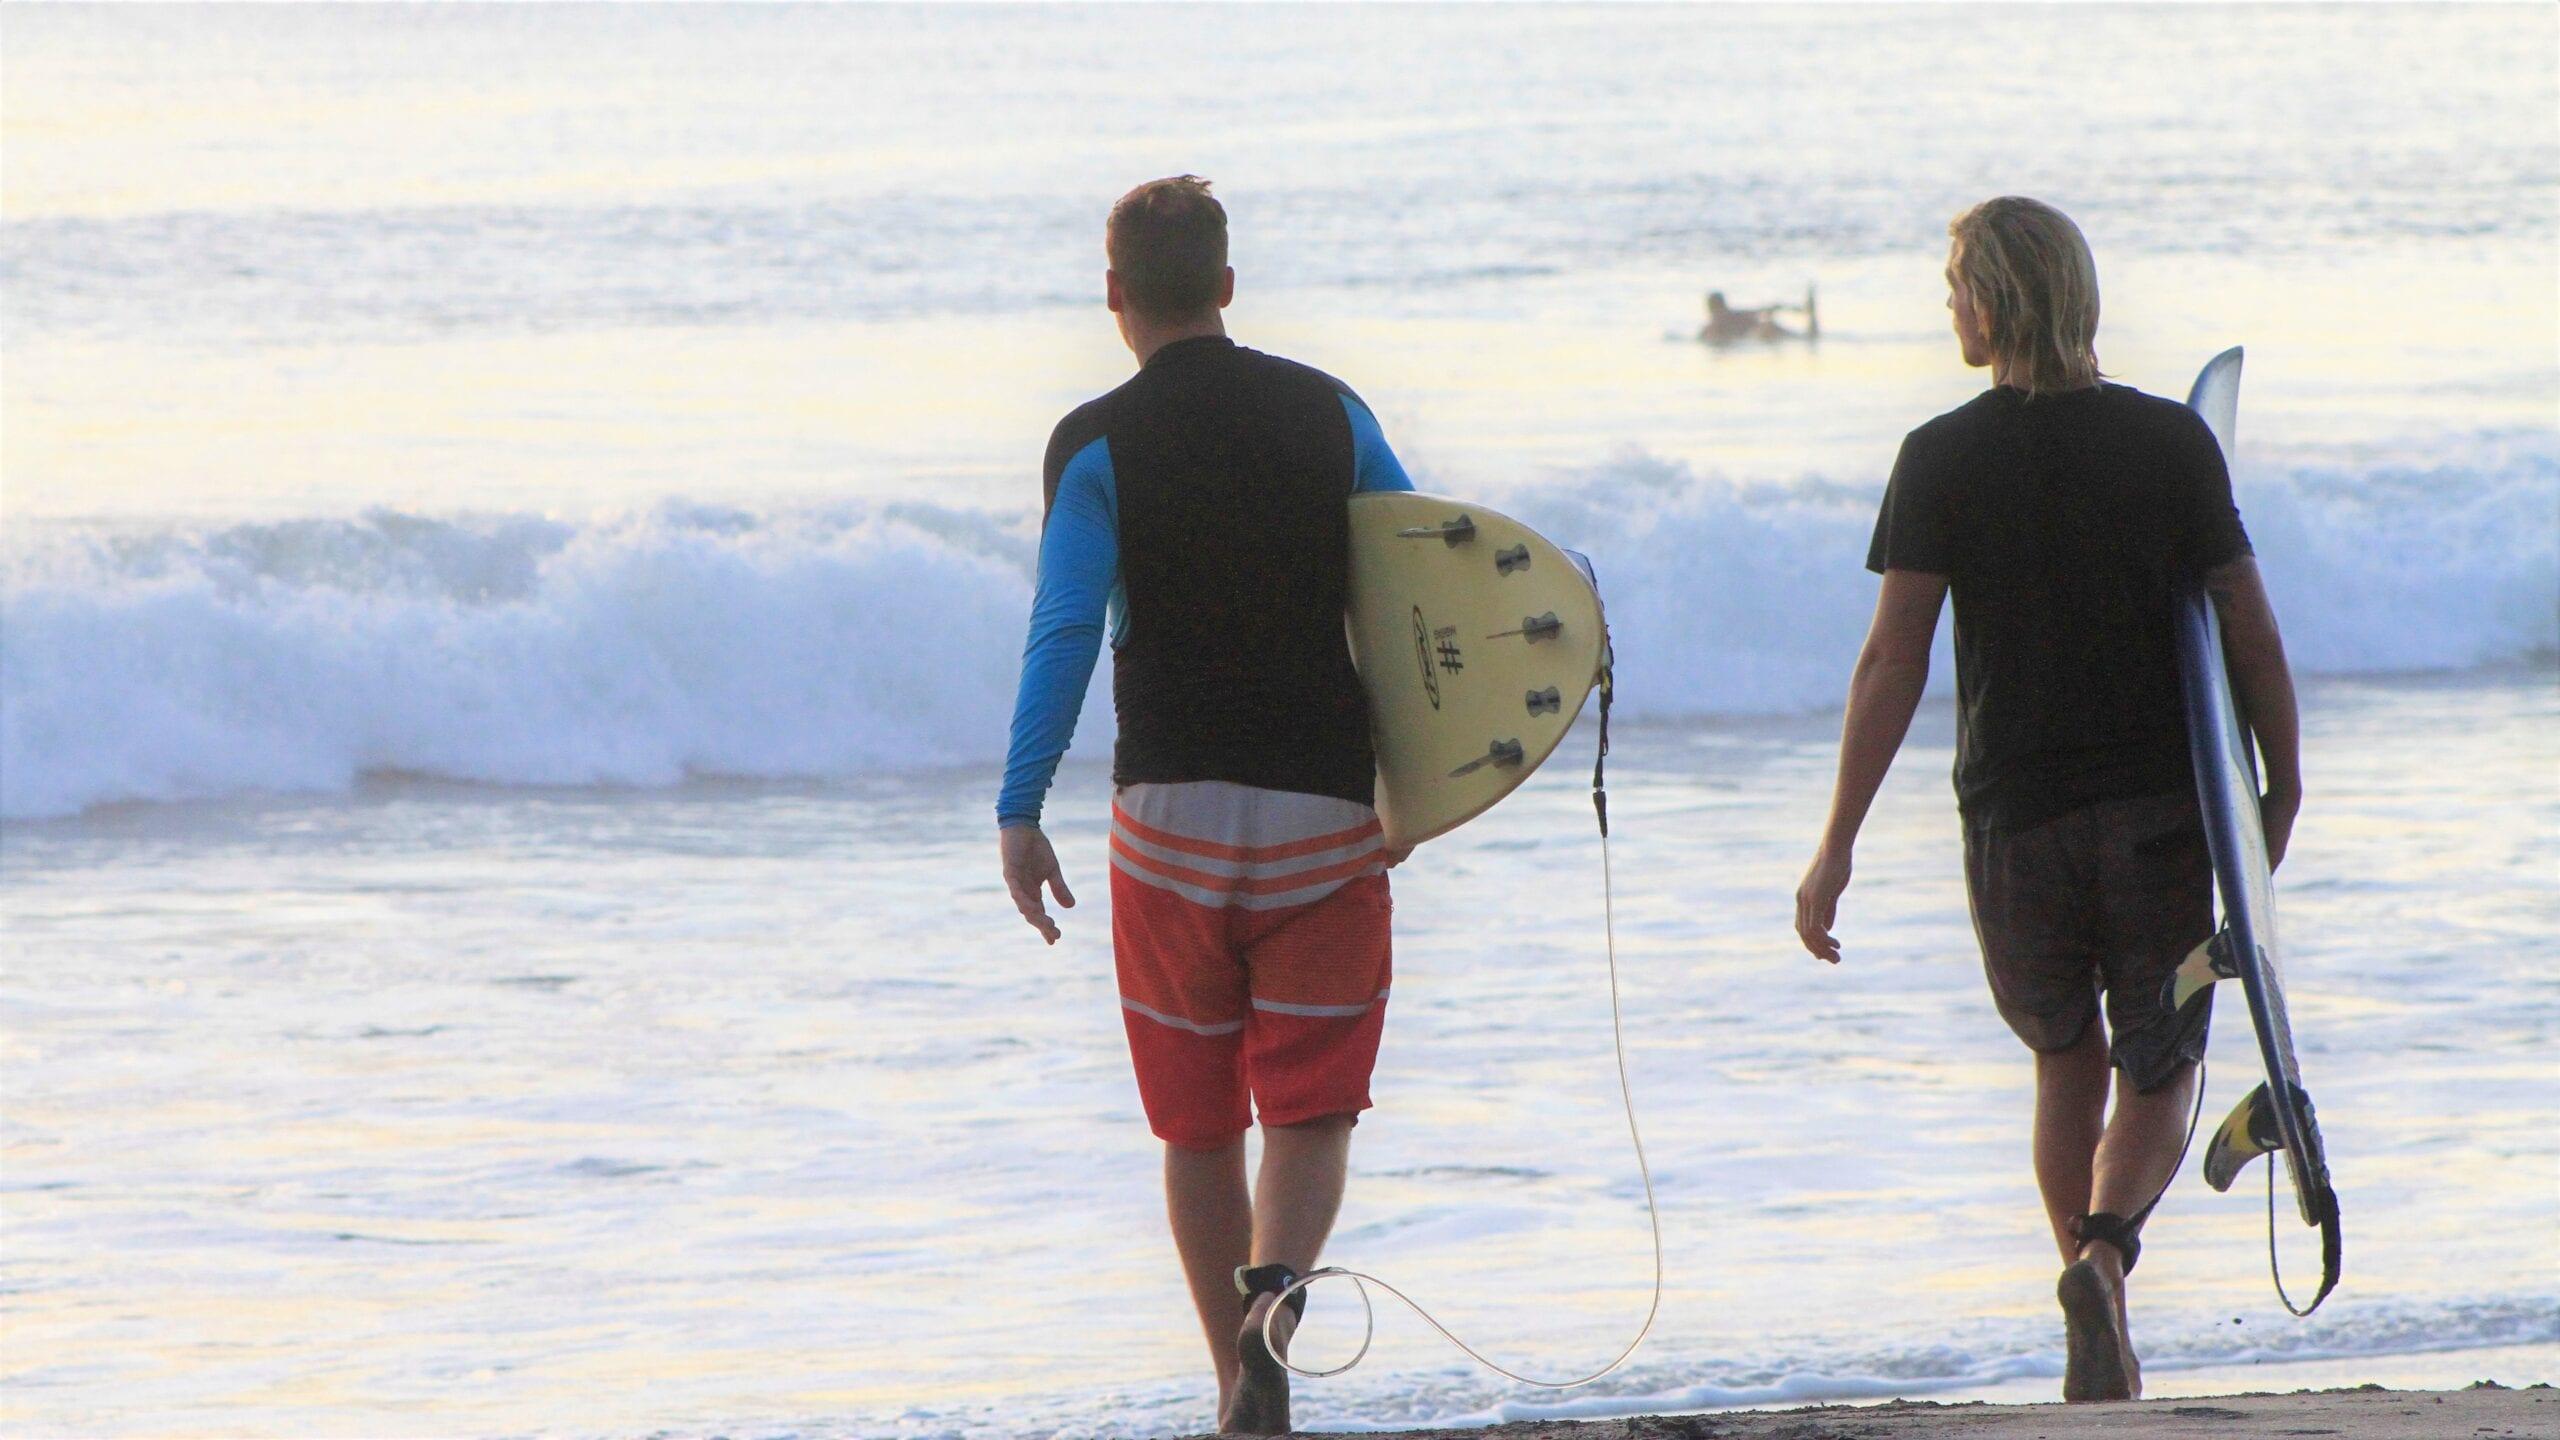 Surfing Nicaragua 13